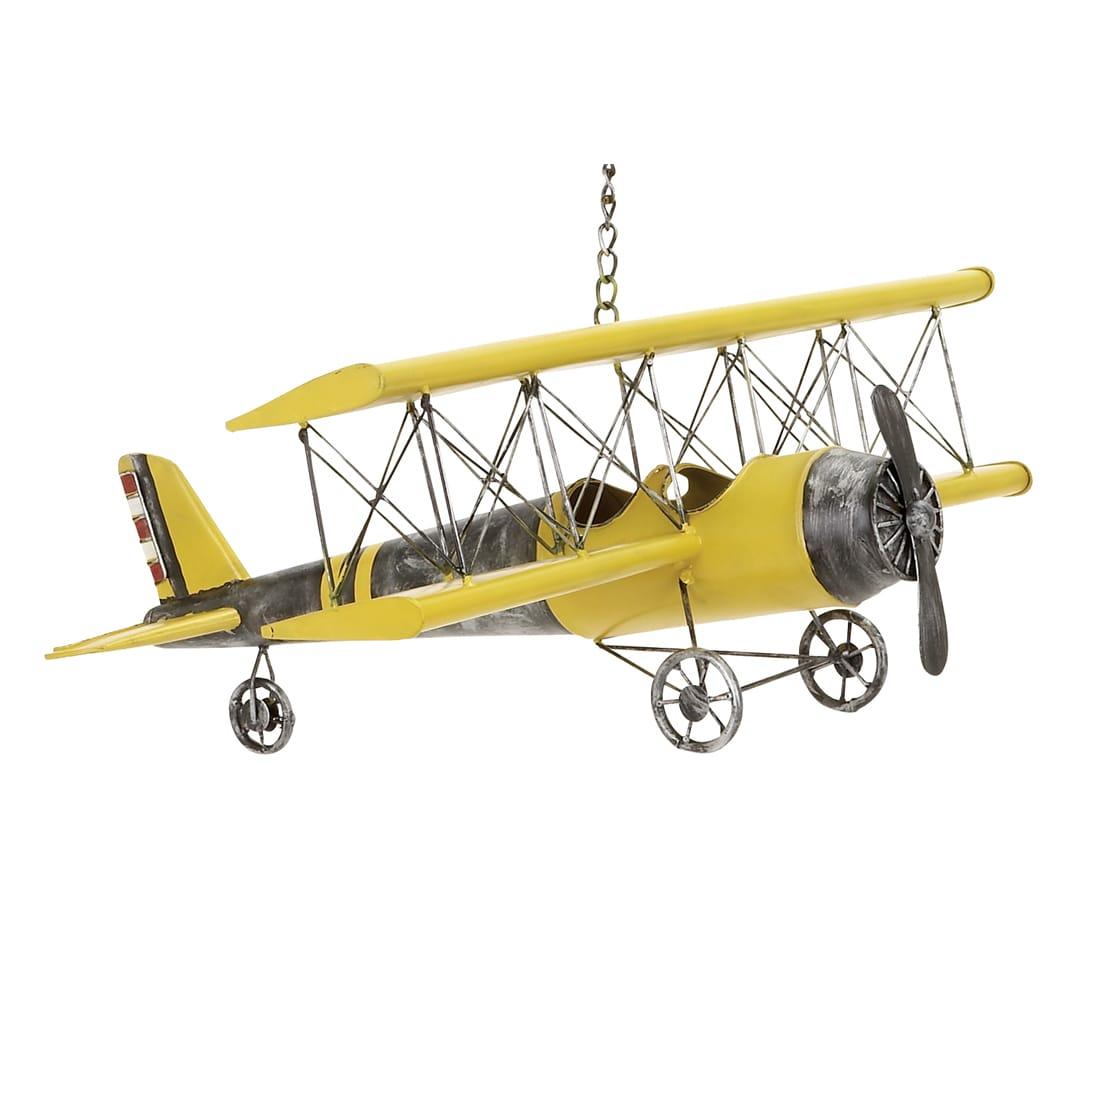 Yellow Antique Die-cast Metal Bi-plane Model